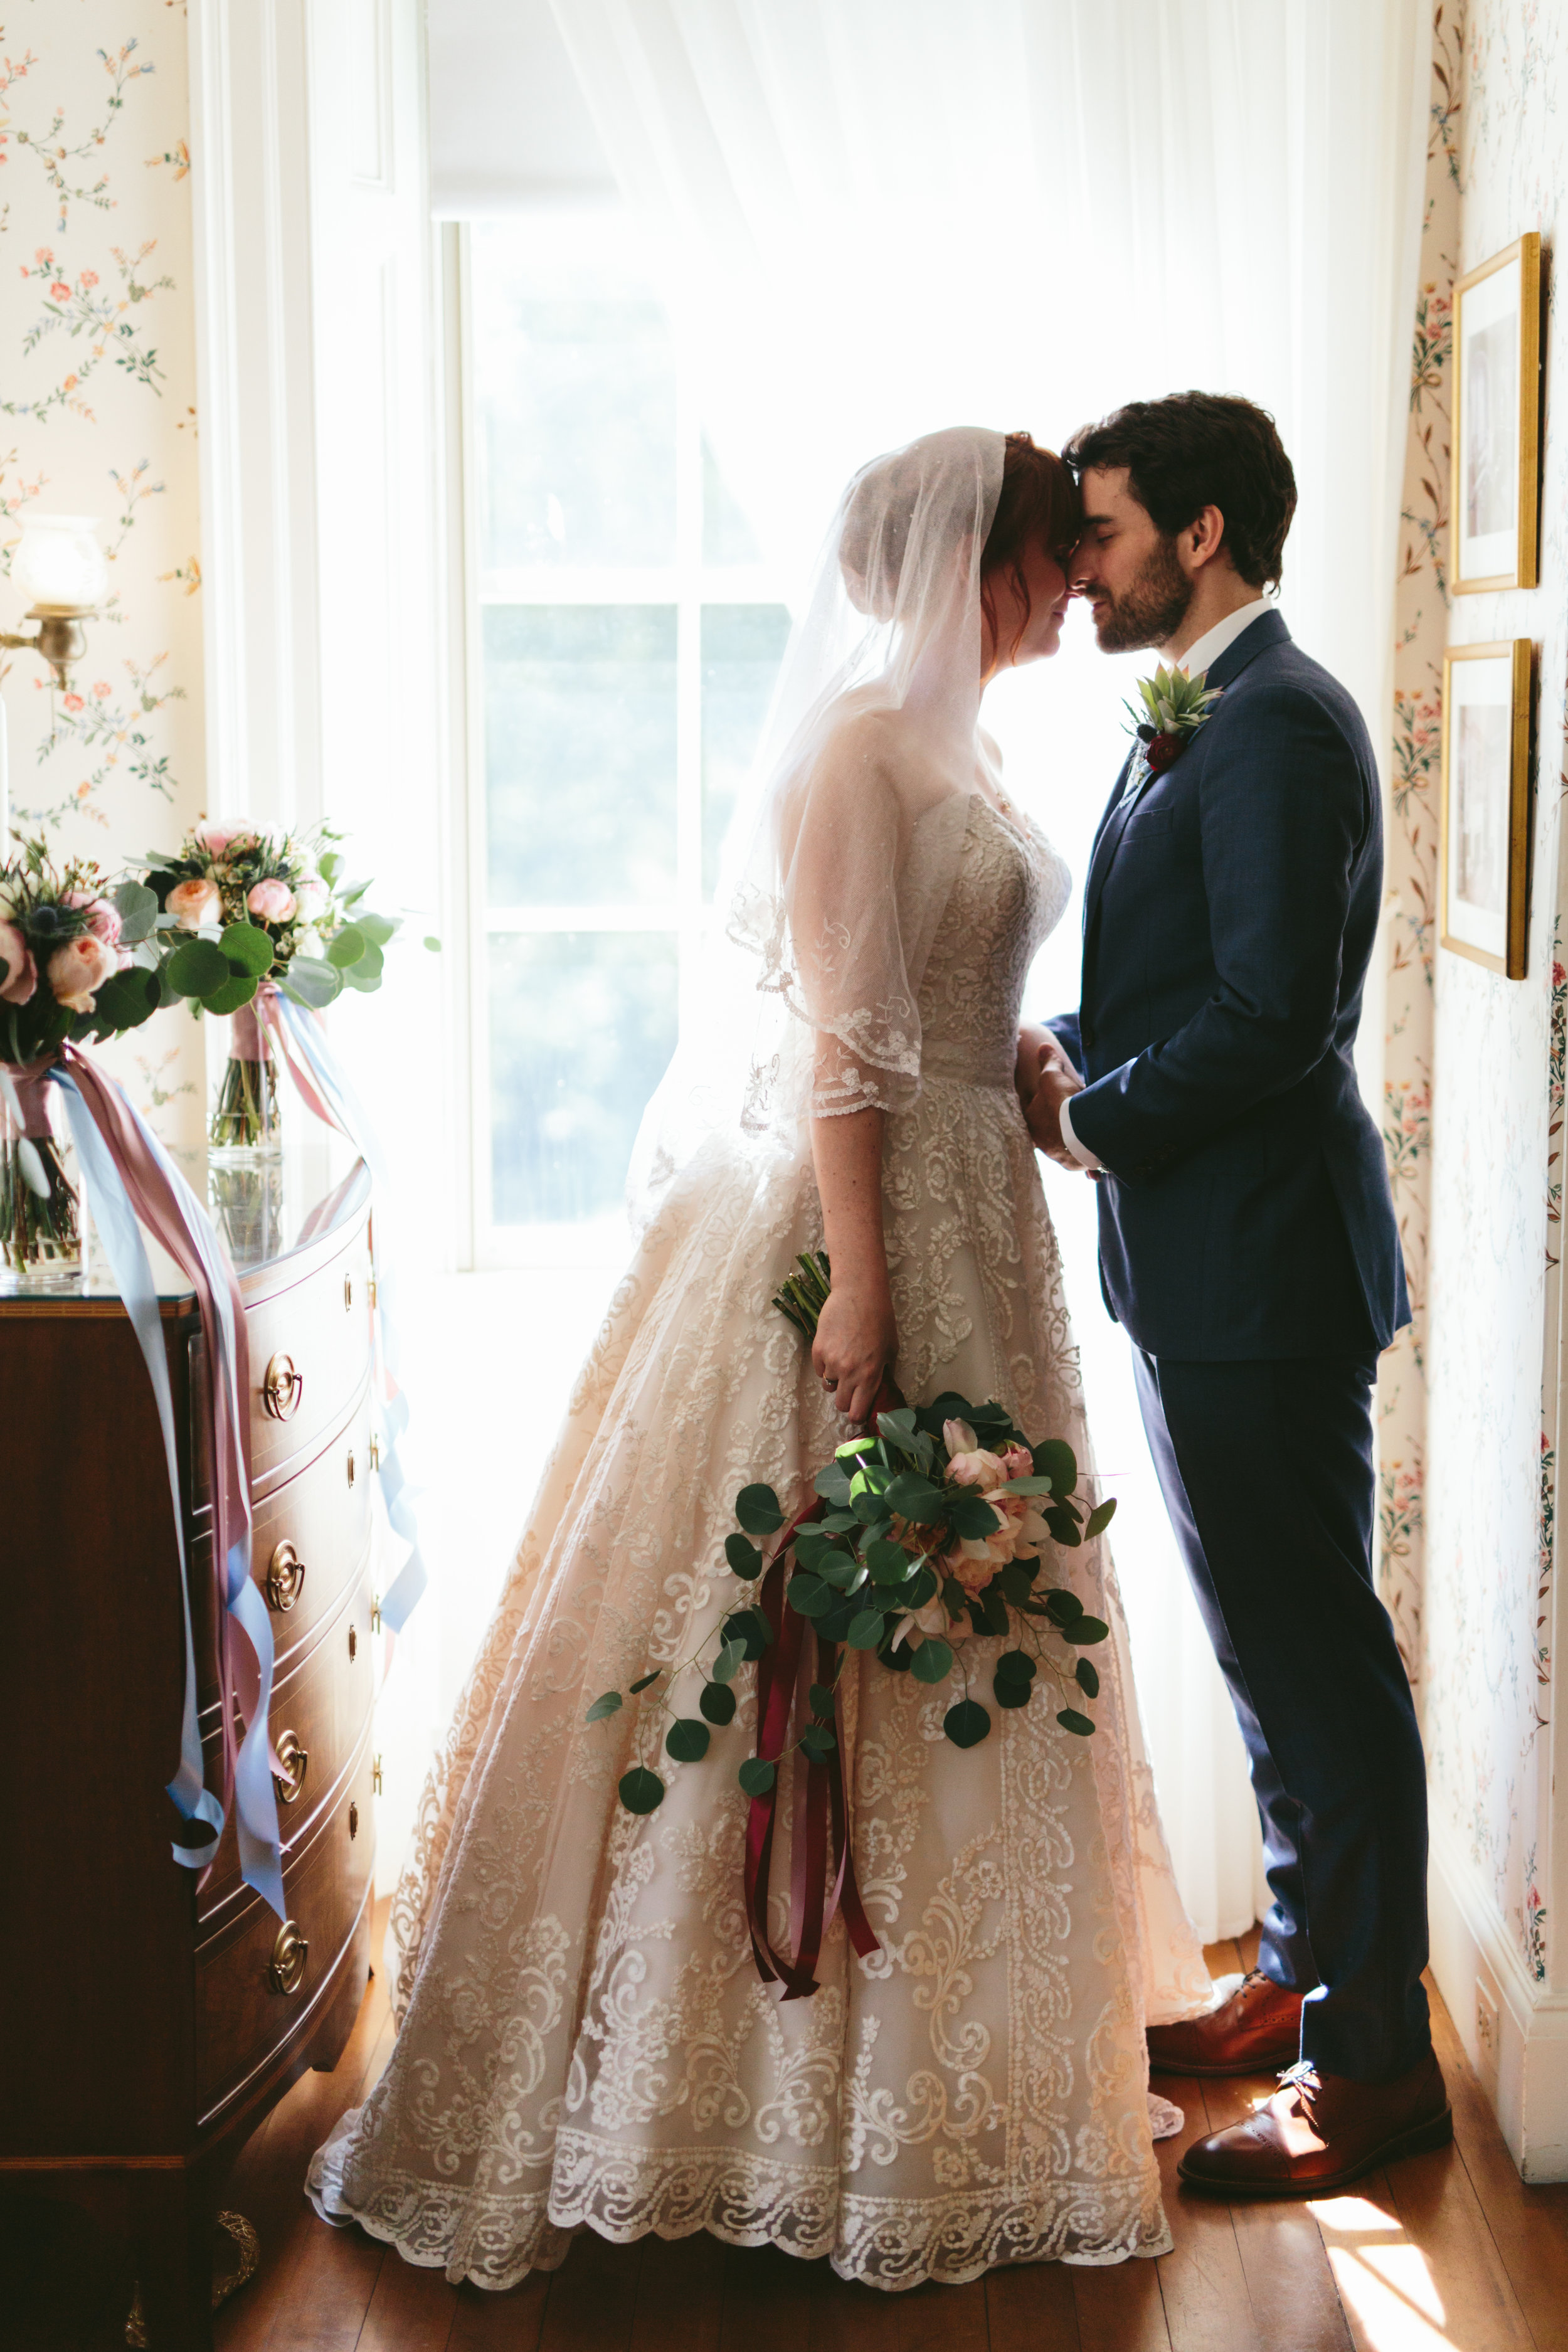 Lauren and Chris - June wedding at The Lyman Estate, Waltham, MA